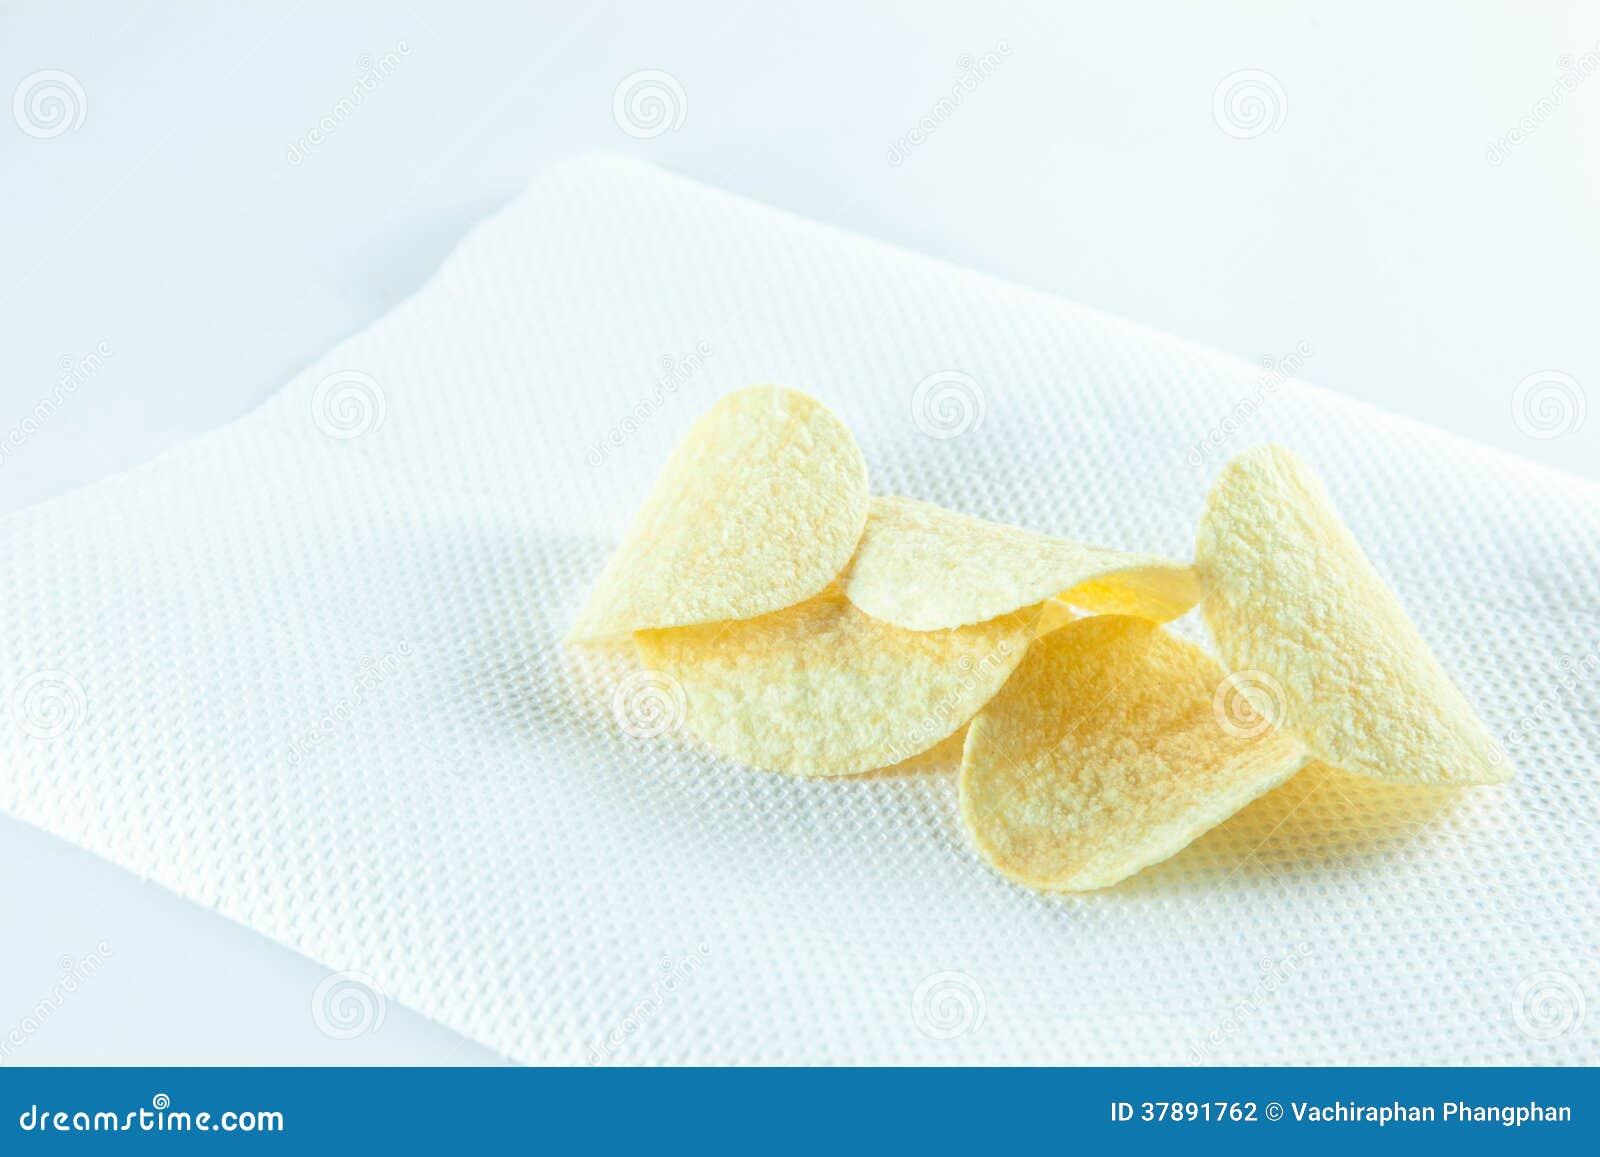 Chips op weefsel.